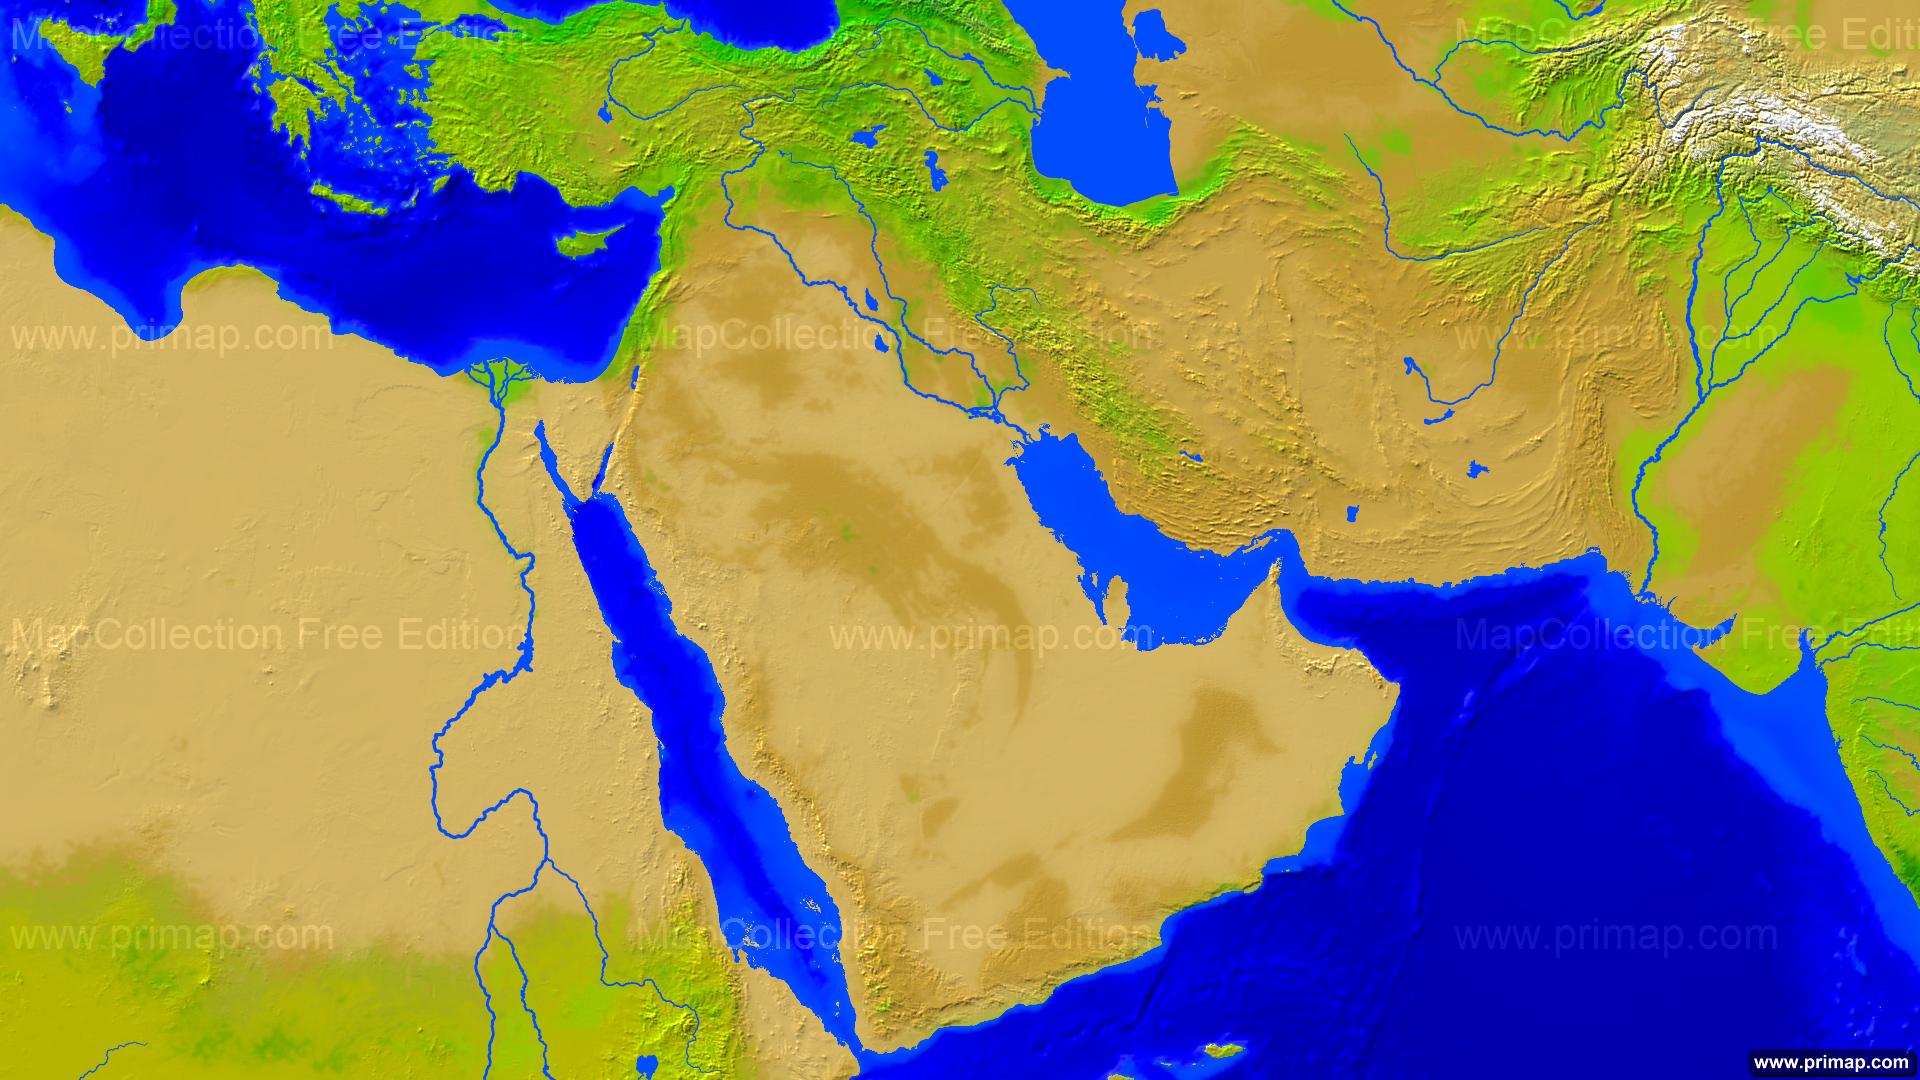 primap National maps